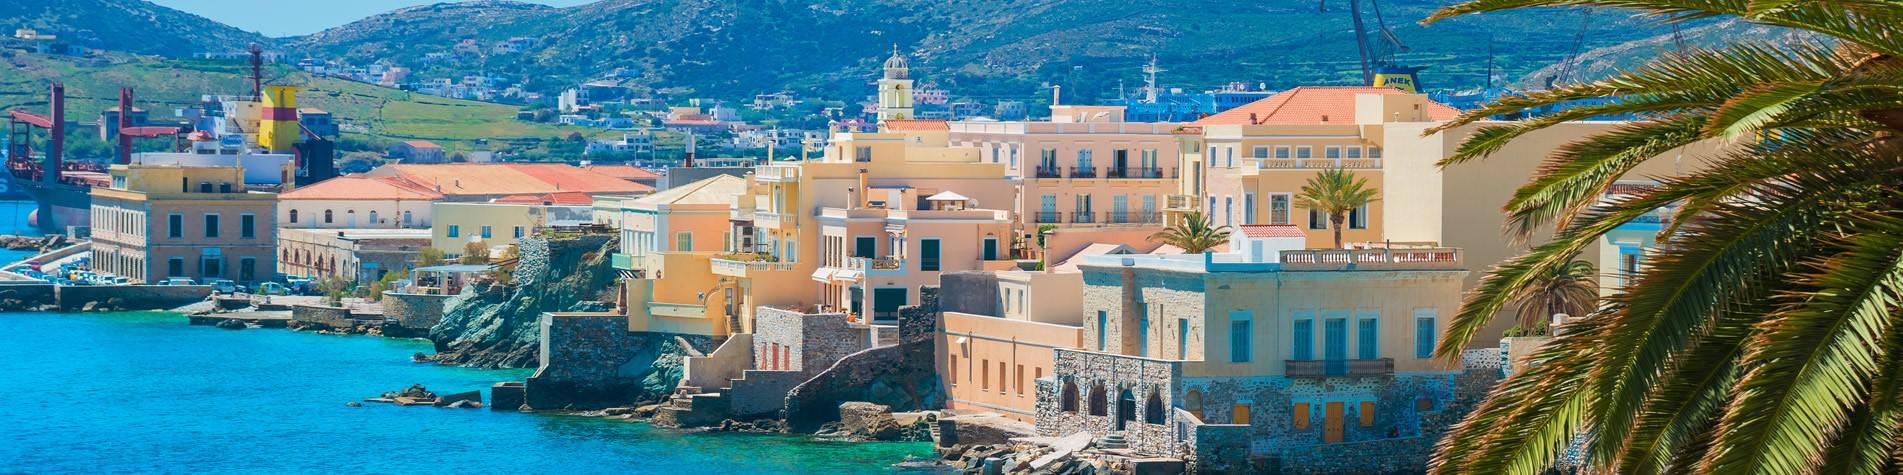 Paros Island Holidays